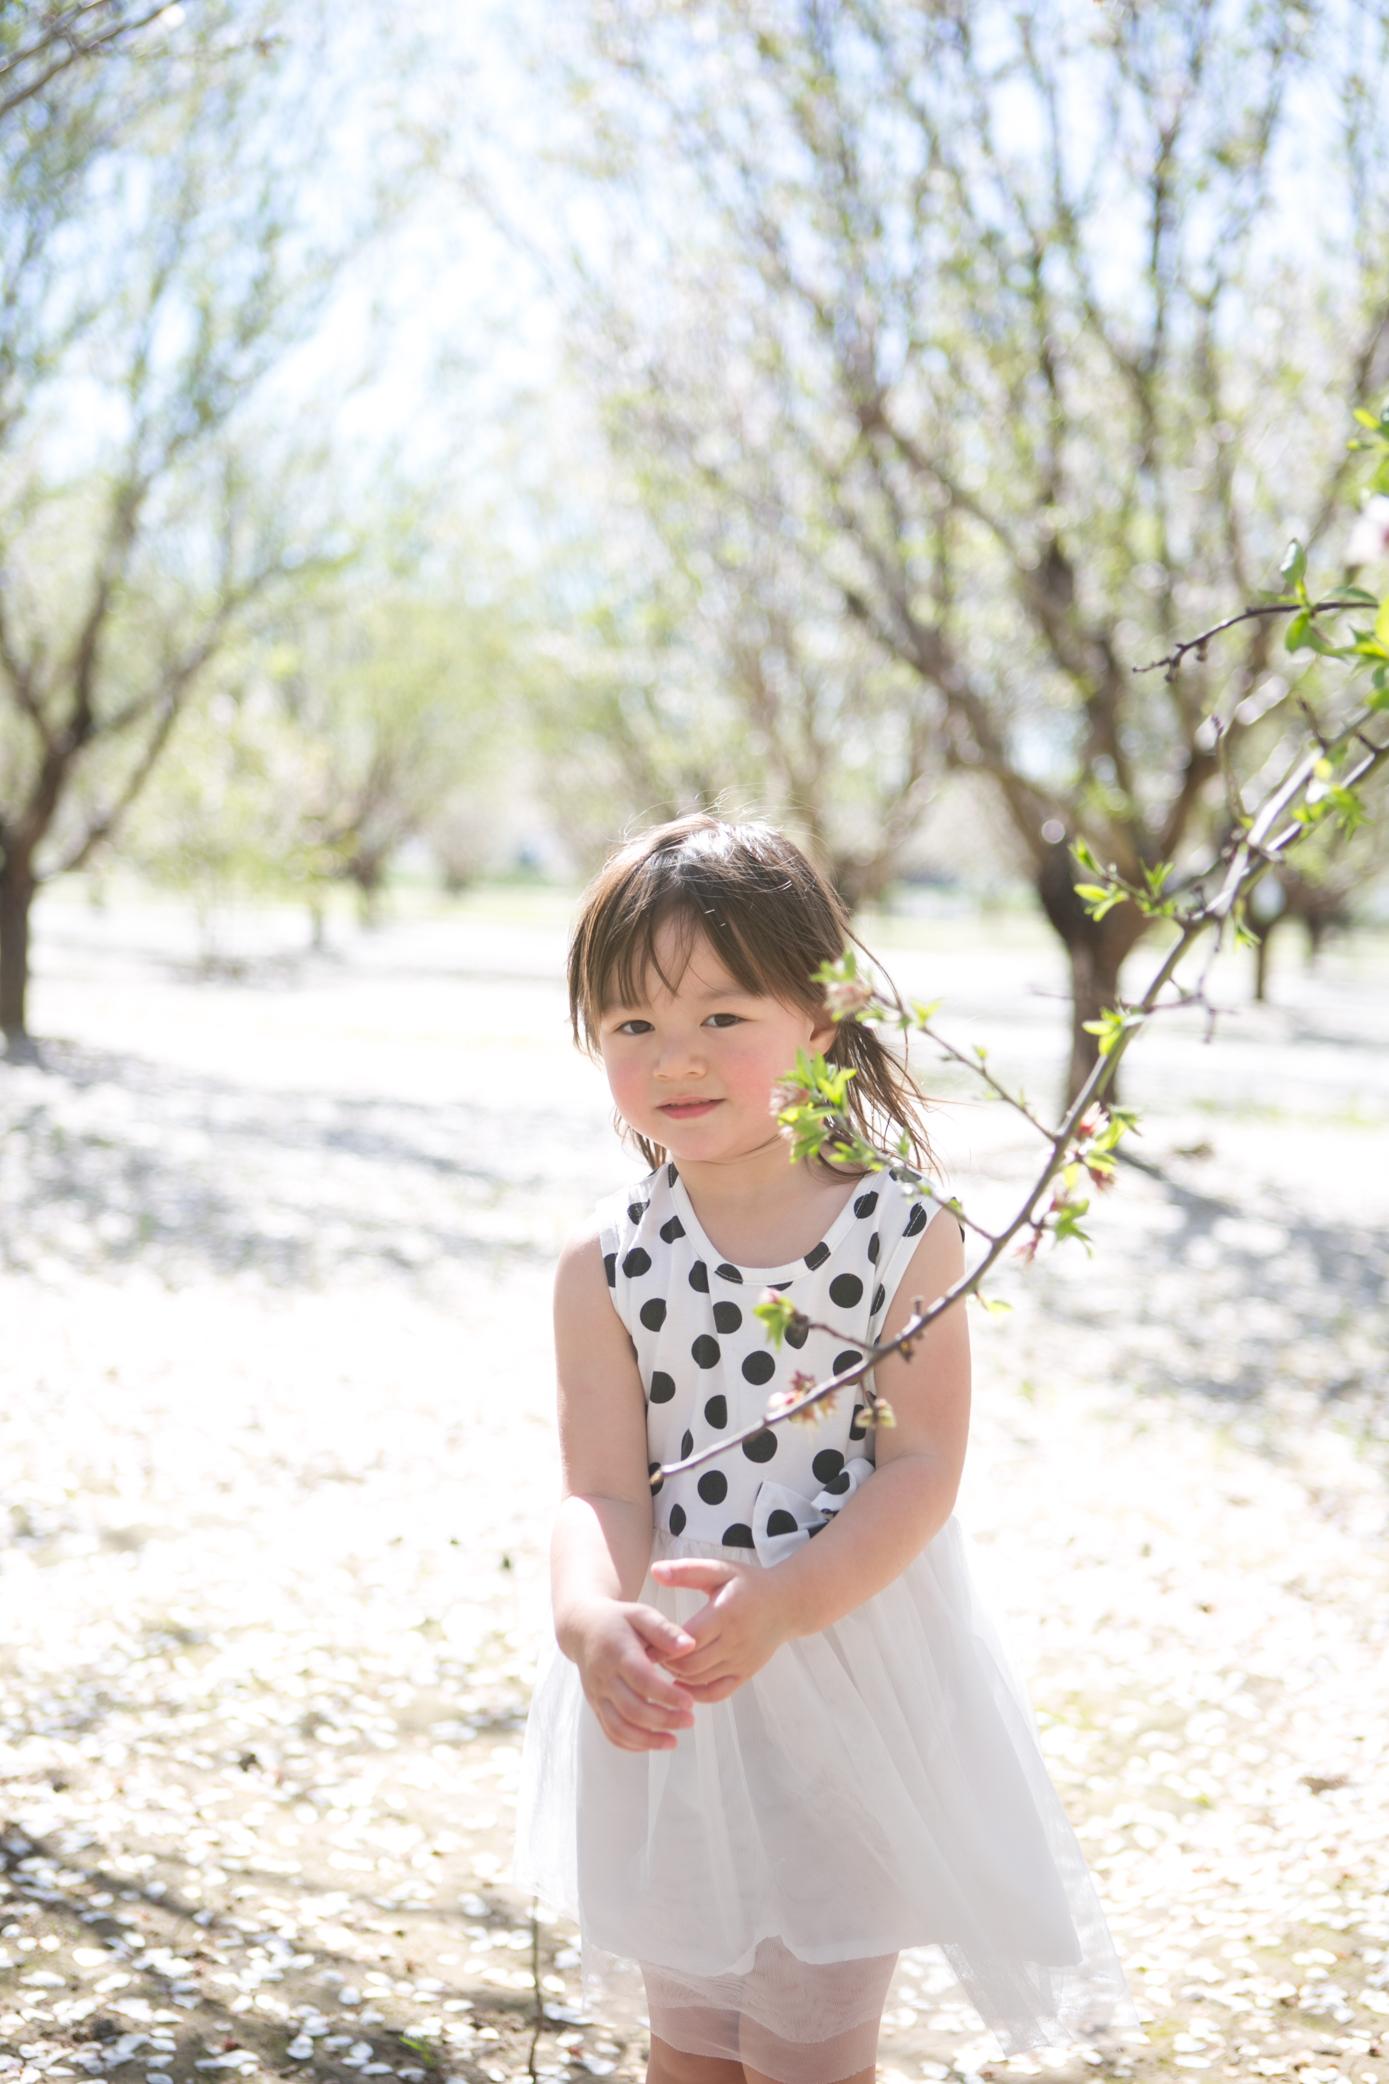 Roseville Family Photographer Lifestyle Family Photography - Michelle Chang Photography